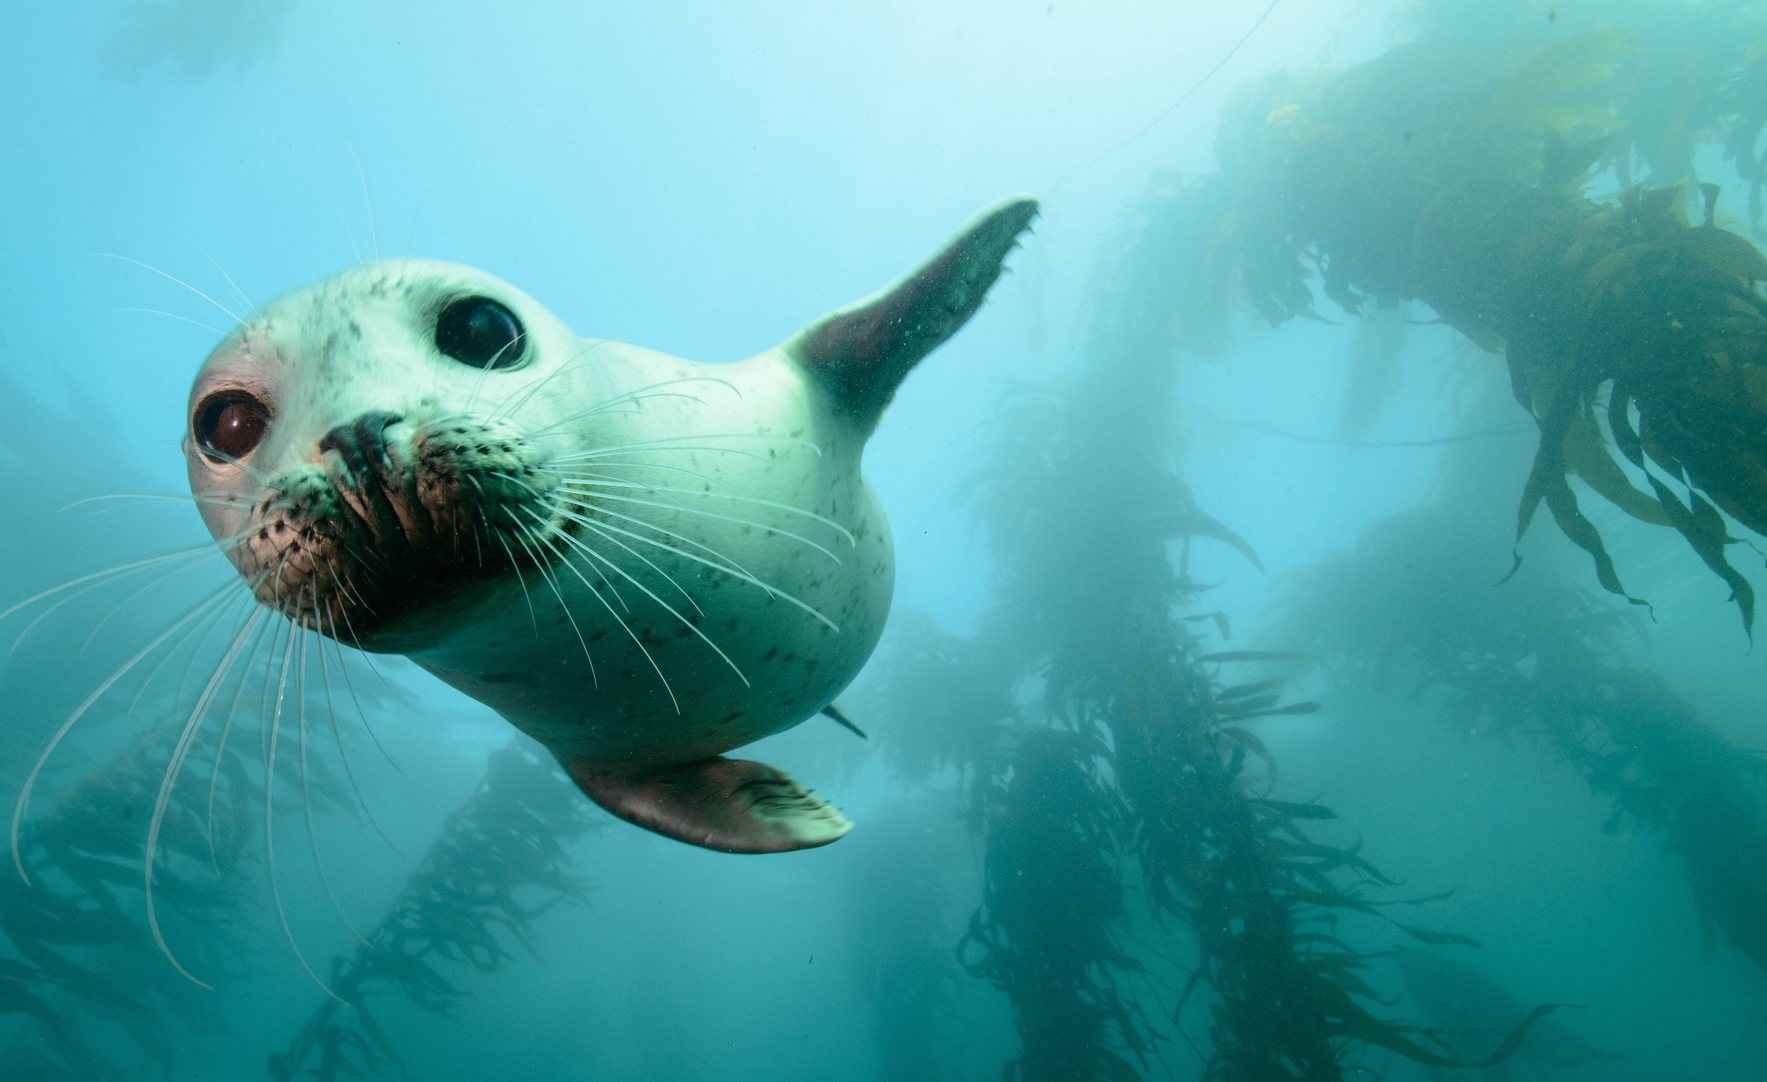 Protect Ocean Wildlife image